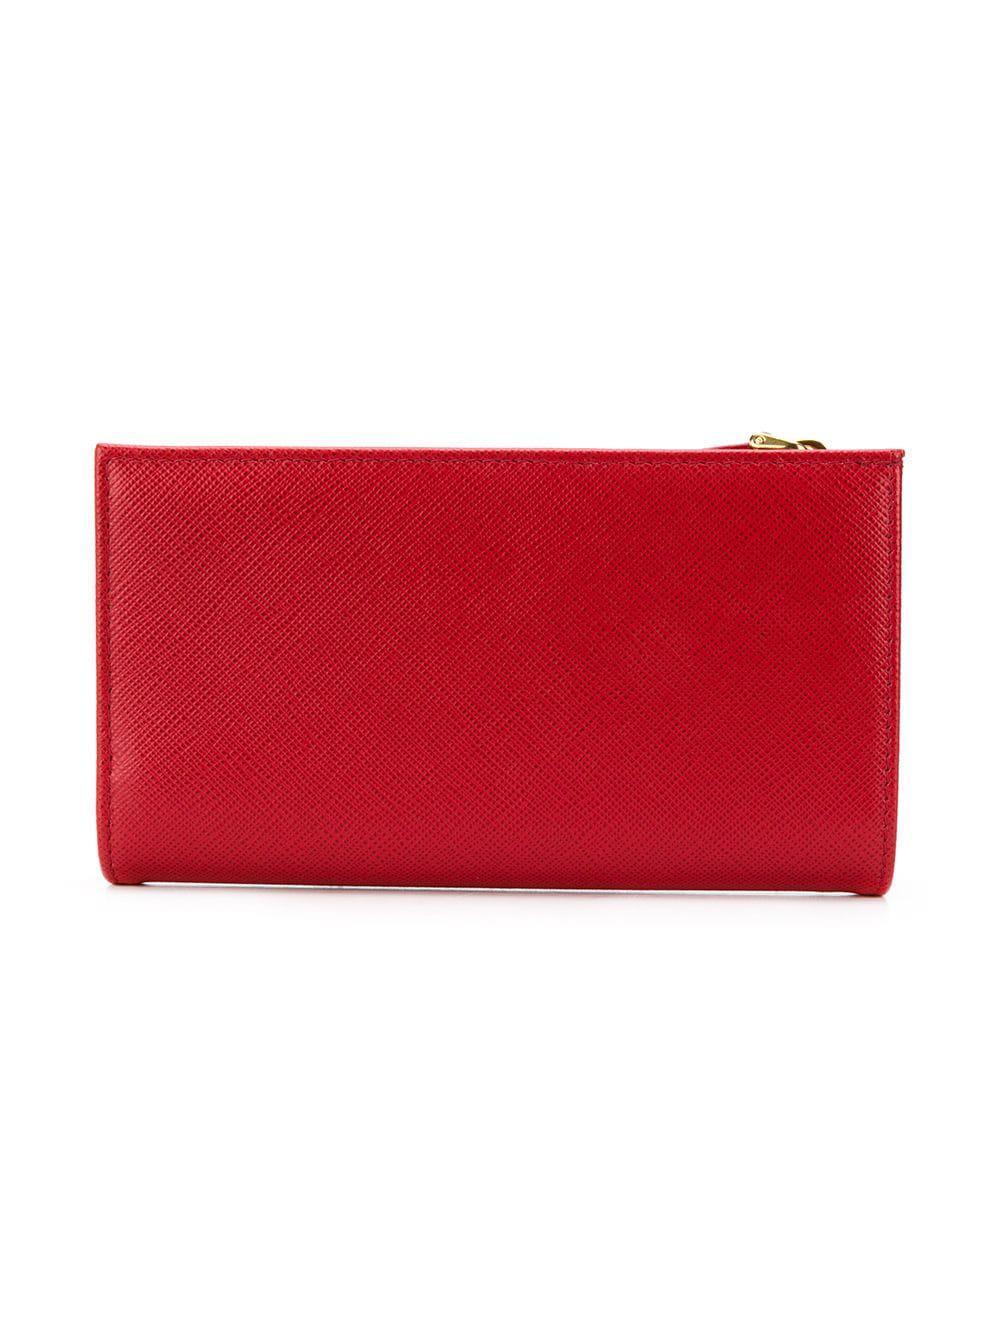 6d6a357fa44bf8 Prada Saffiano Slim Wallet in Red - Lyst